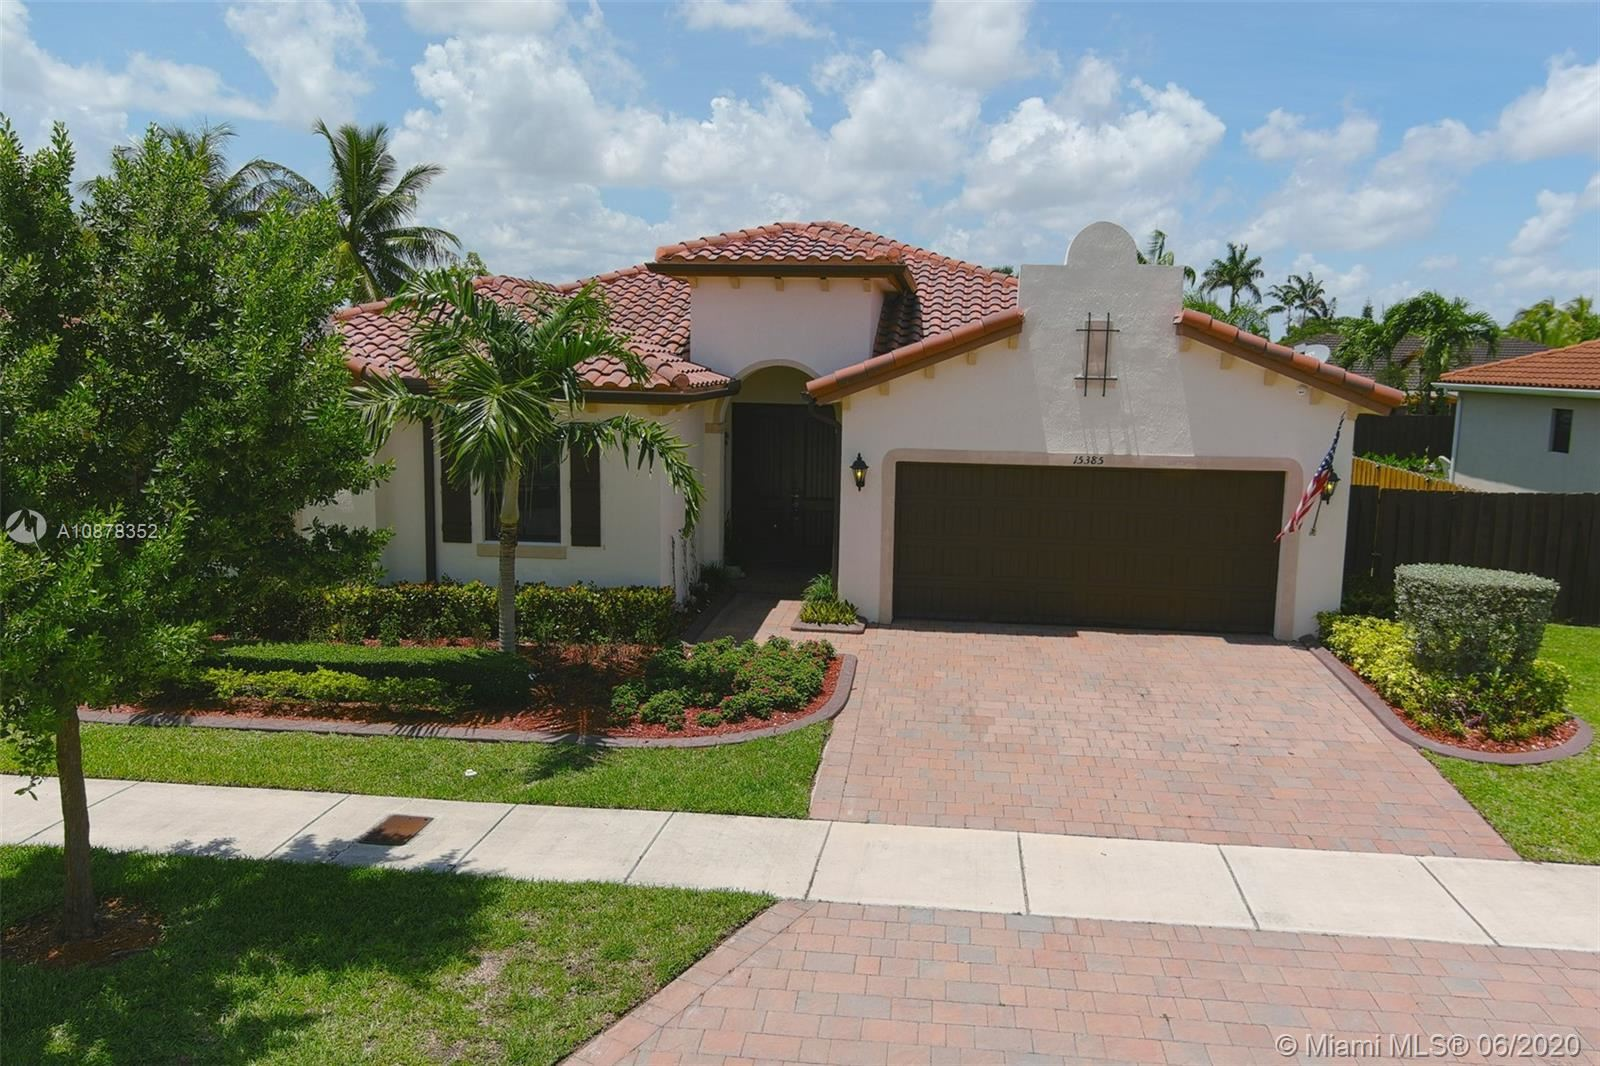 15385 SW 173rd St, Miami, FL 33187 - #: A10878352